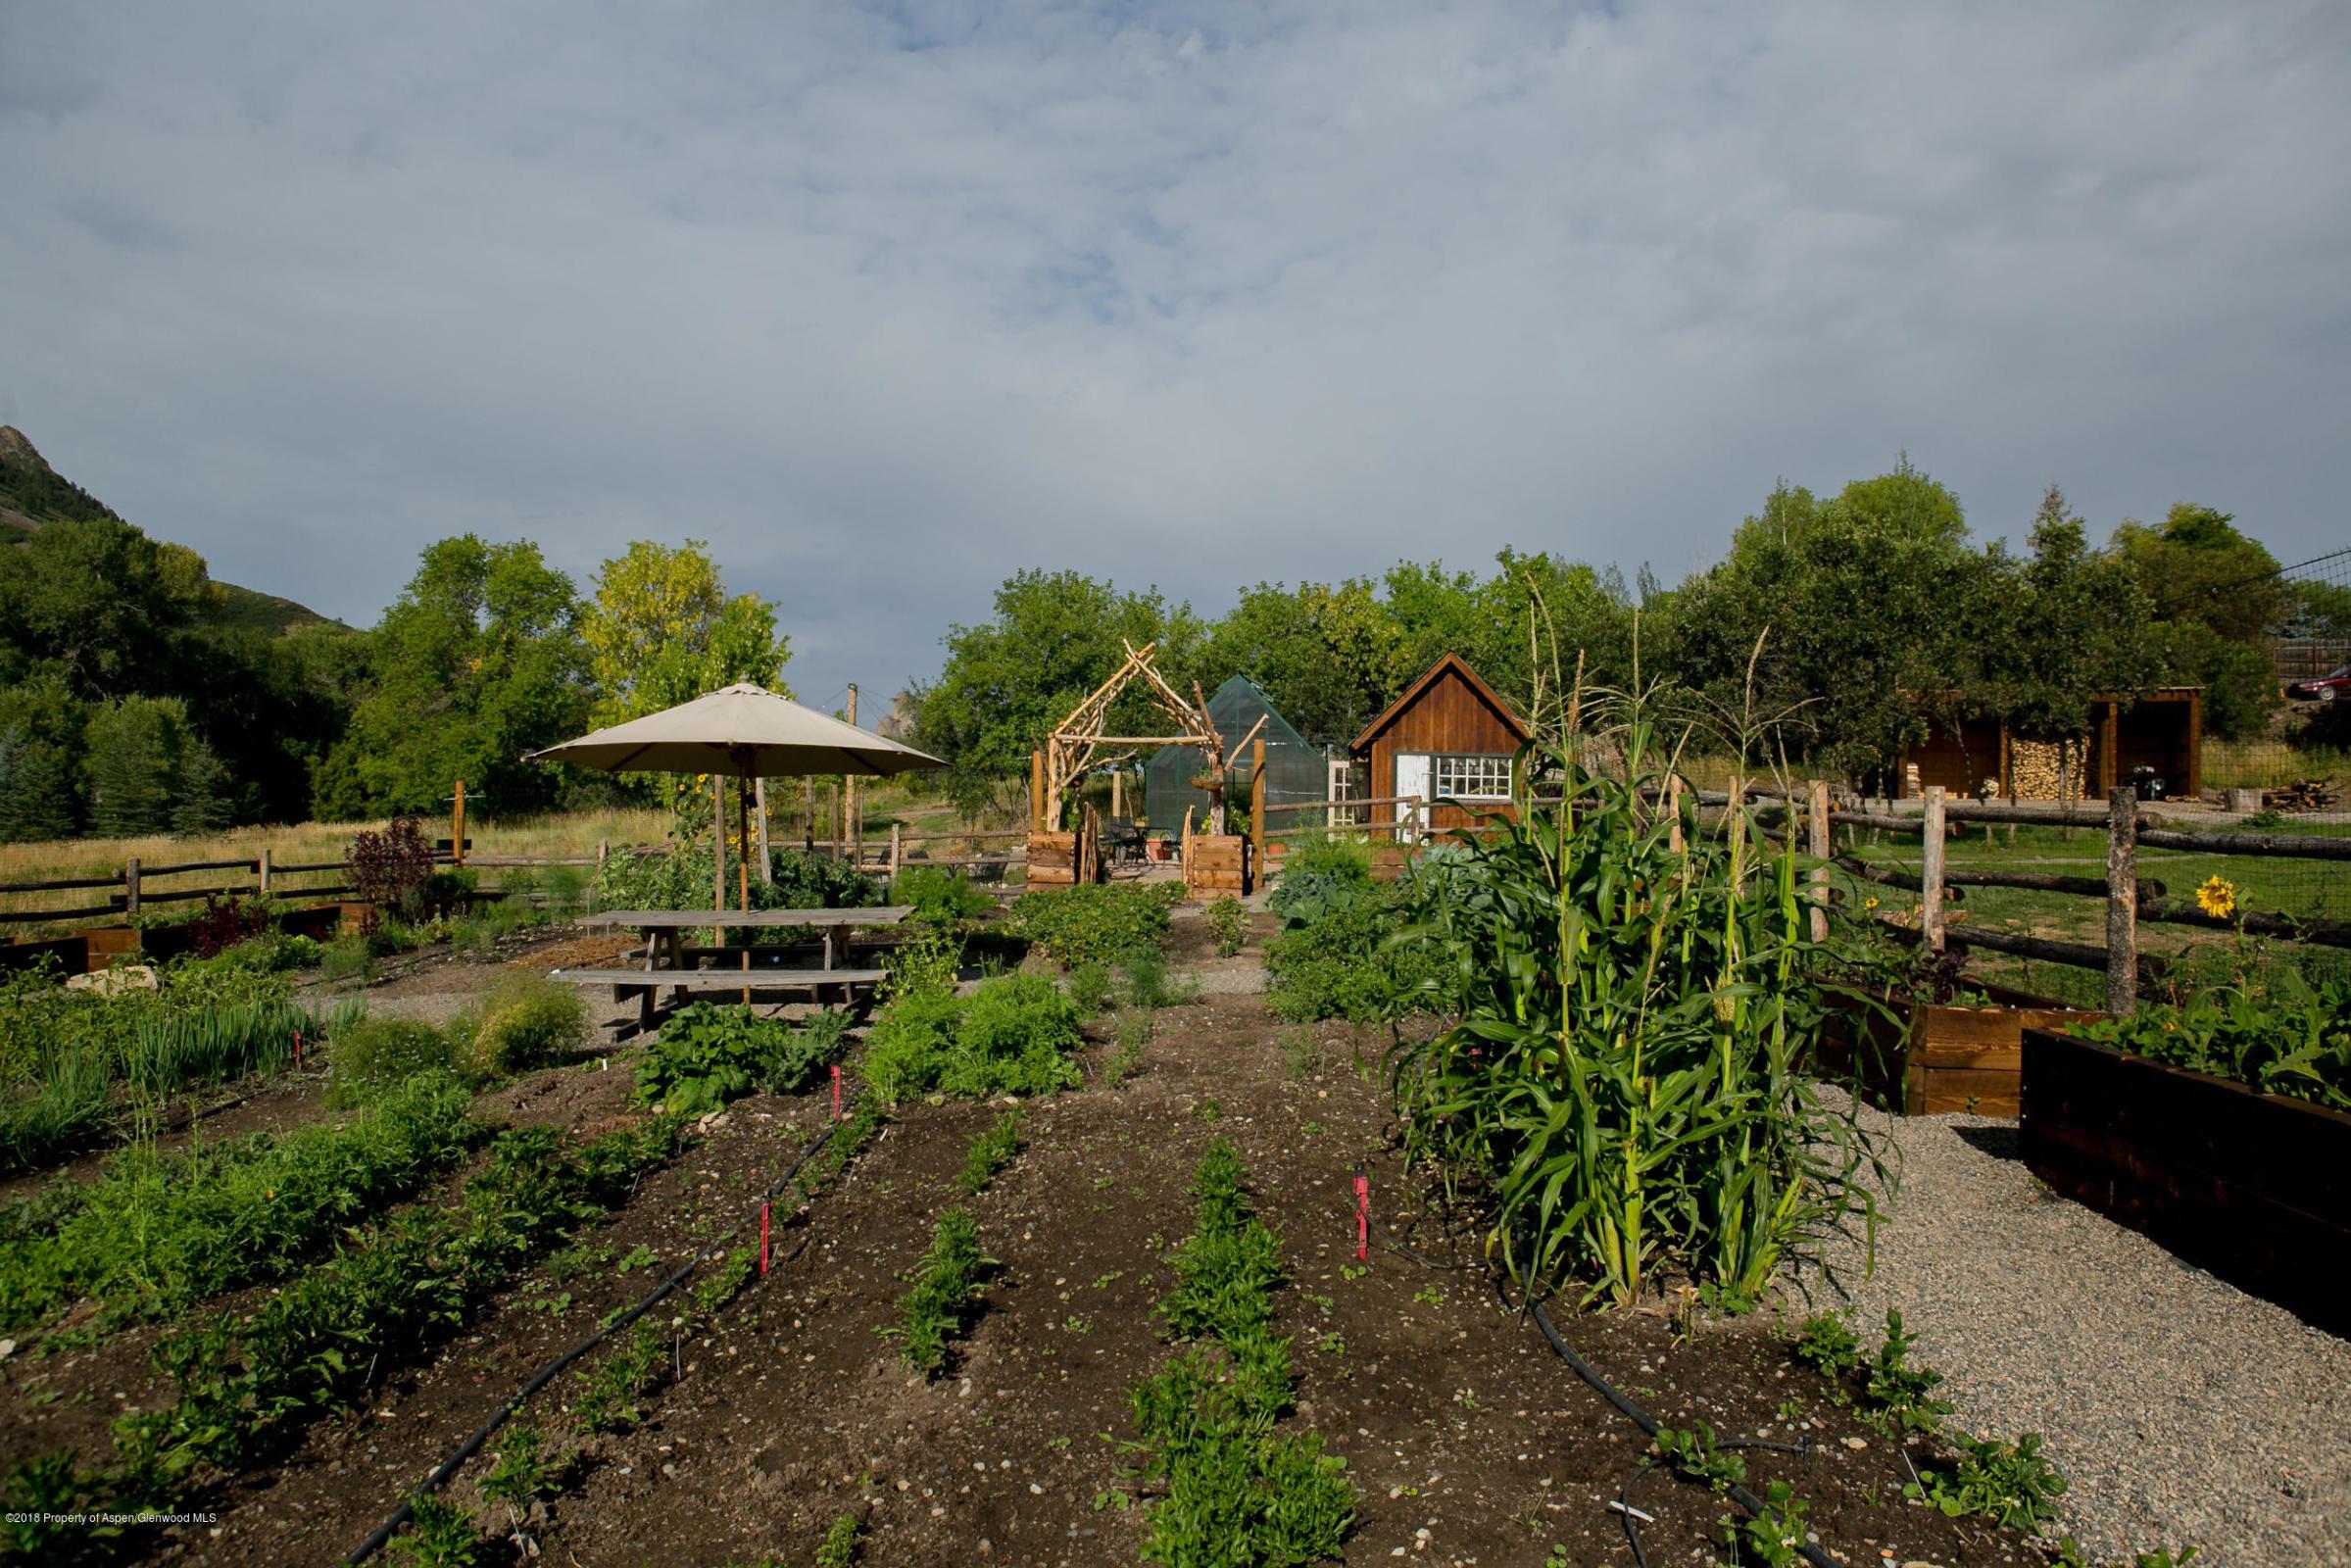 Most Fertile Soil Grows the Best Food